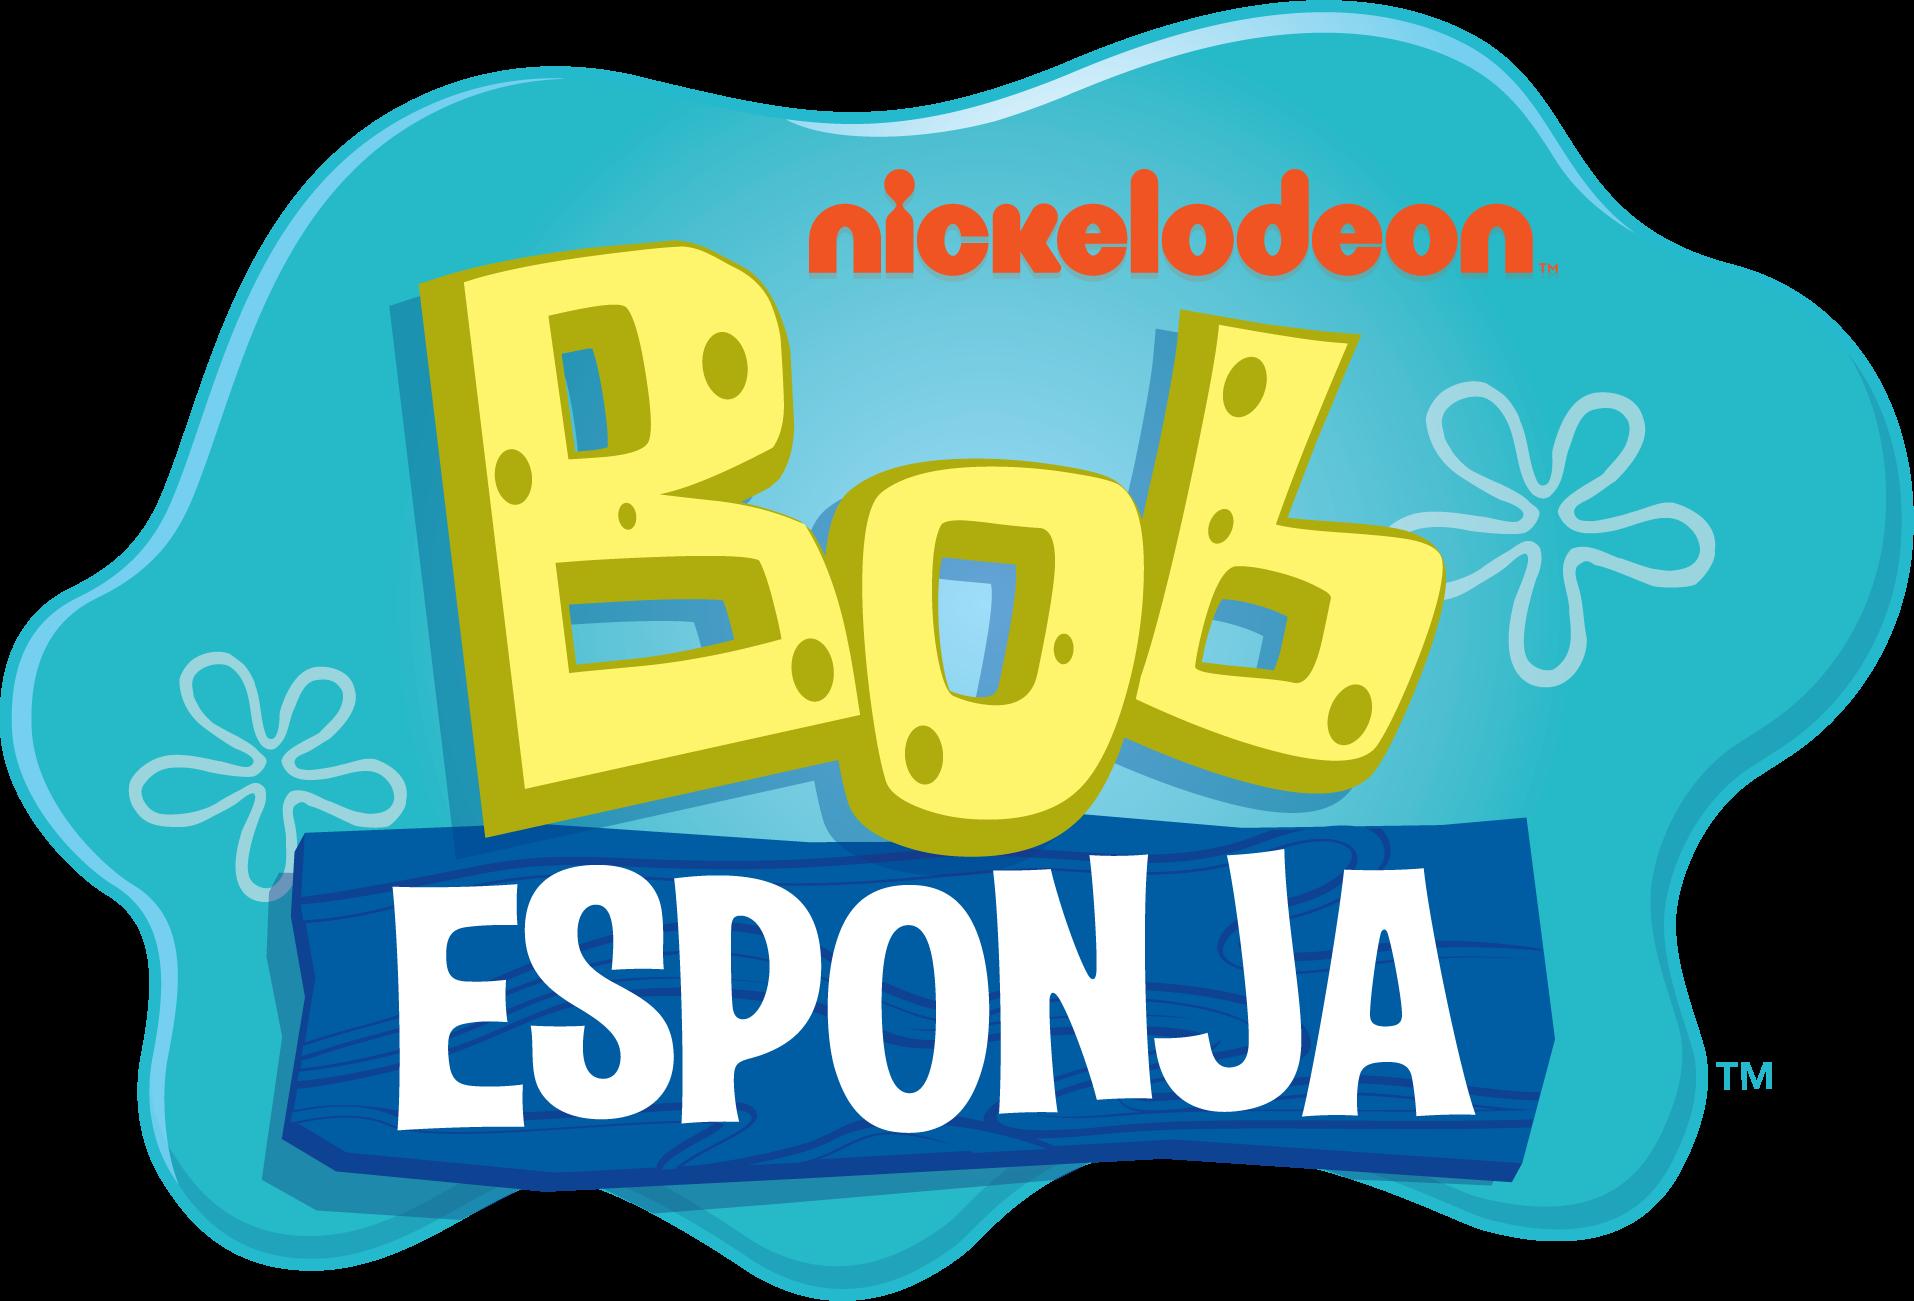 Bob Esponja Latin American Spanish Encyclopedia Spongebobia Fandom